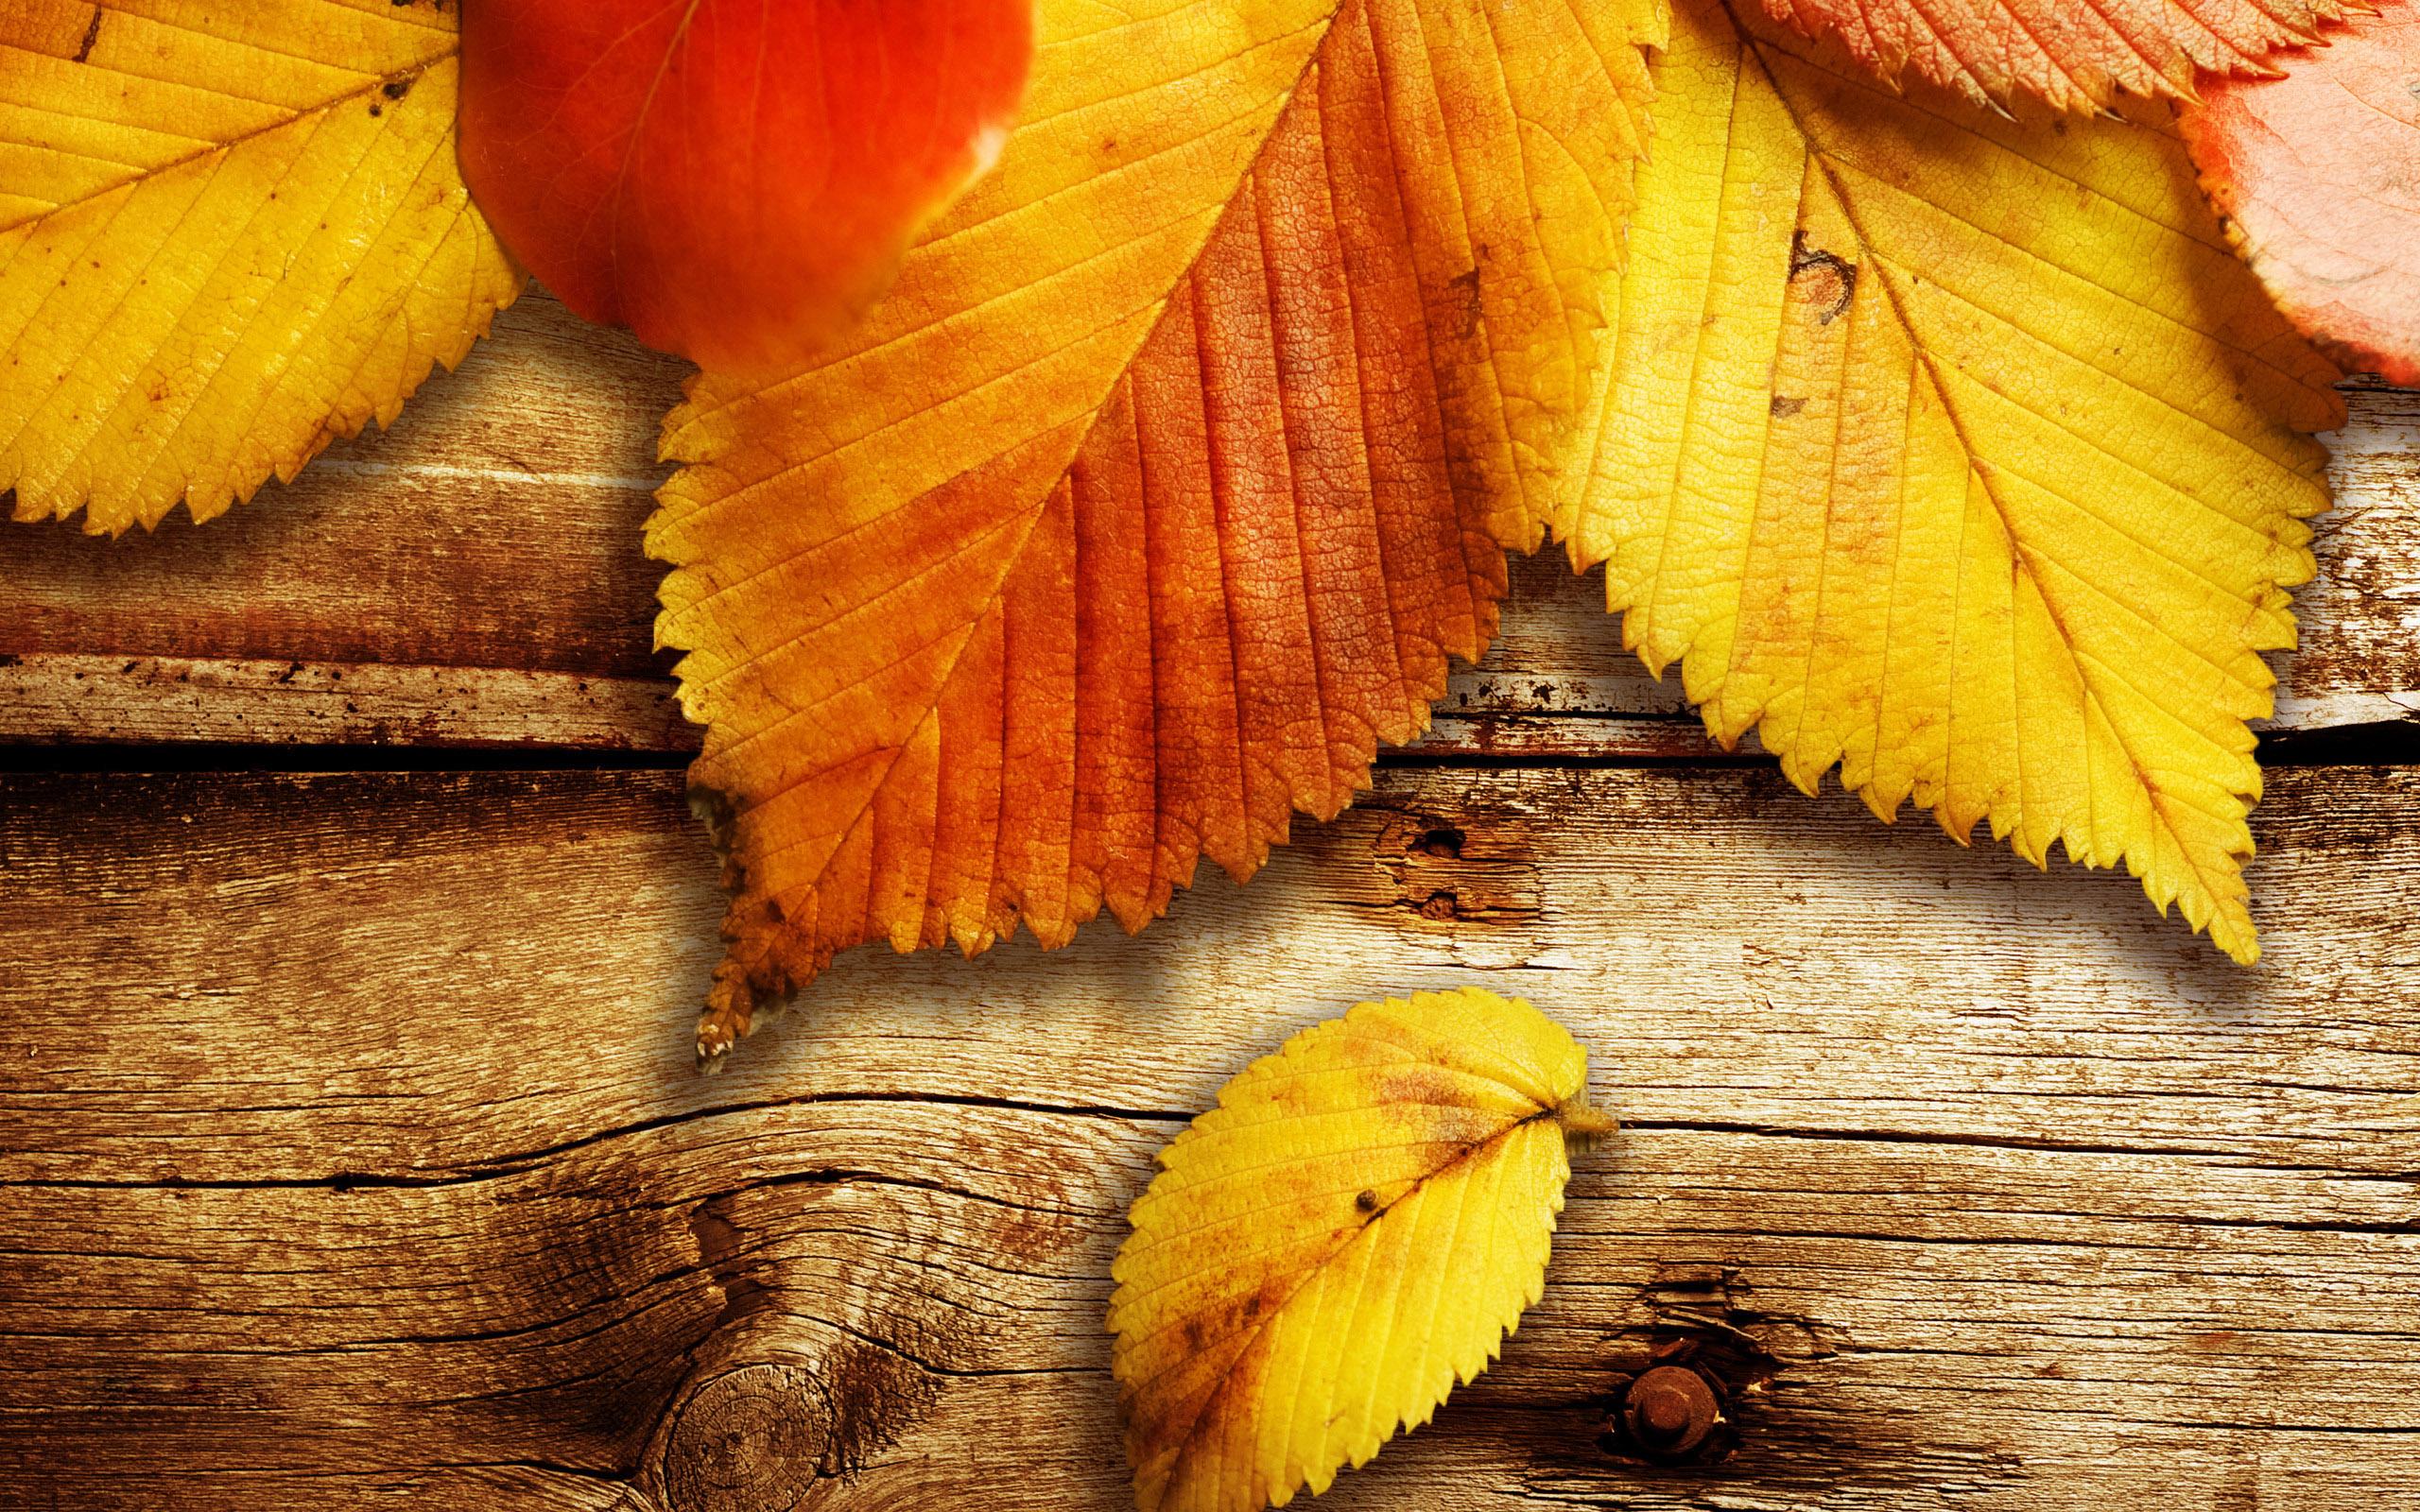 Фон осень обои на рабочий стол